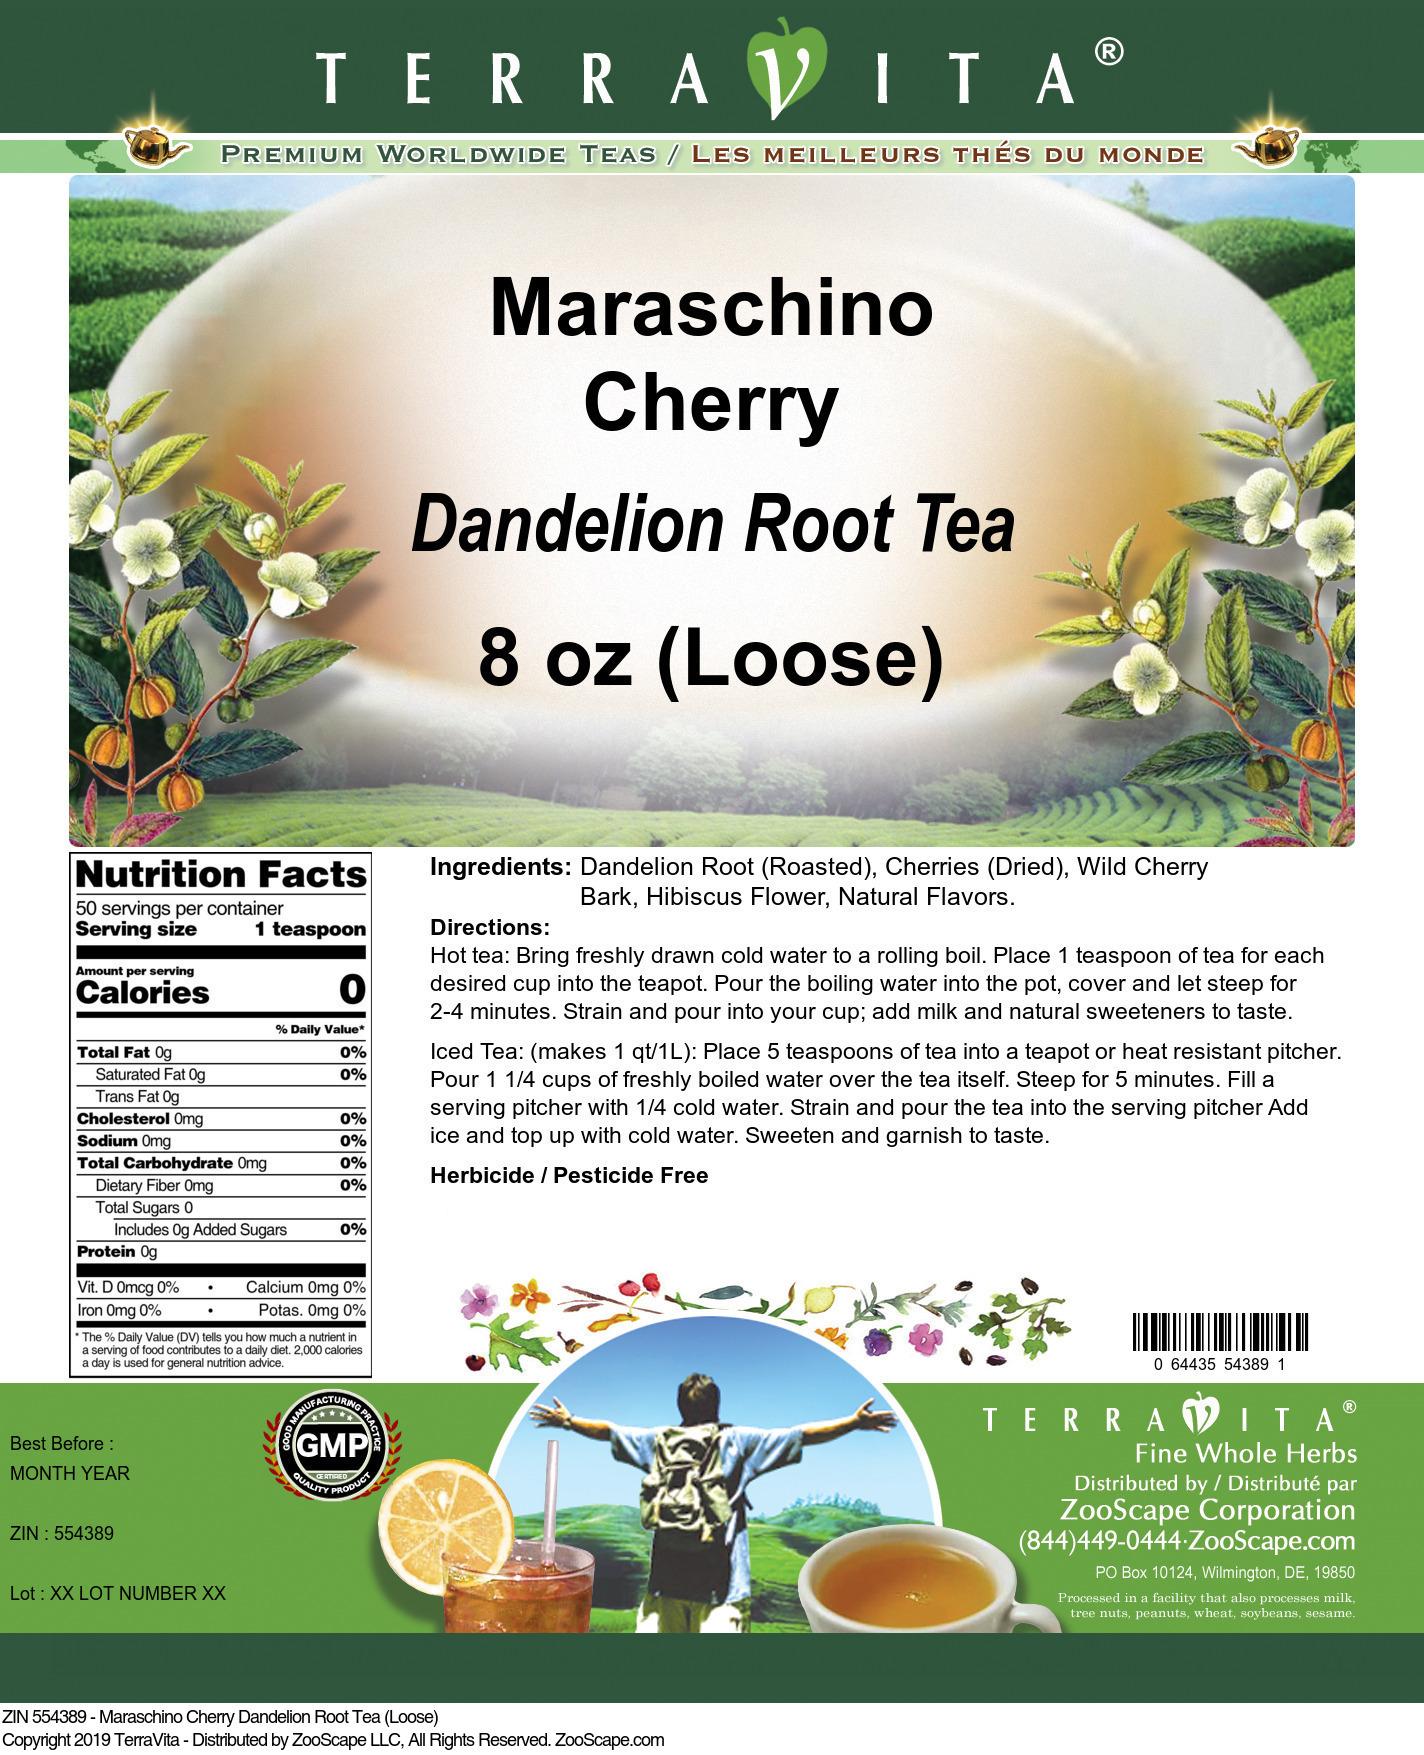 Maraschino Cherry Dandelion Root Tea (Loose)